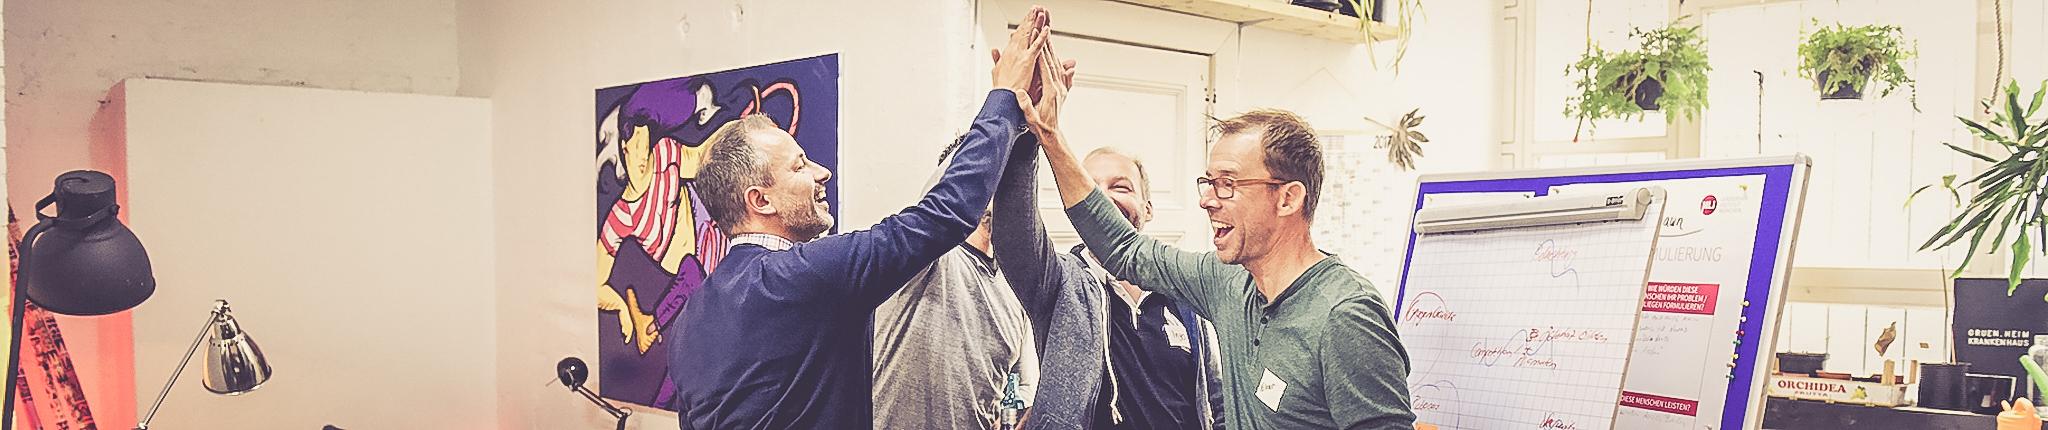 Agile Meets Leadership – FLI Academy